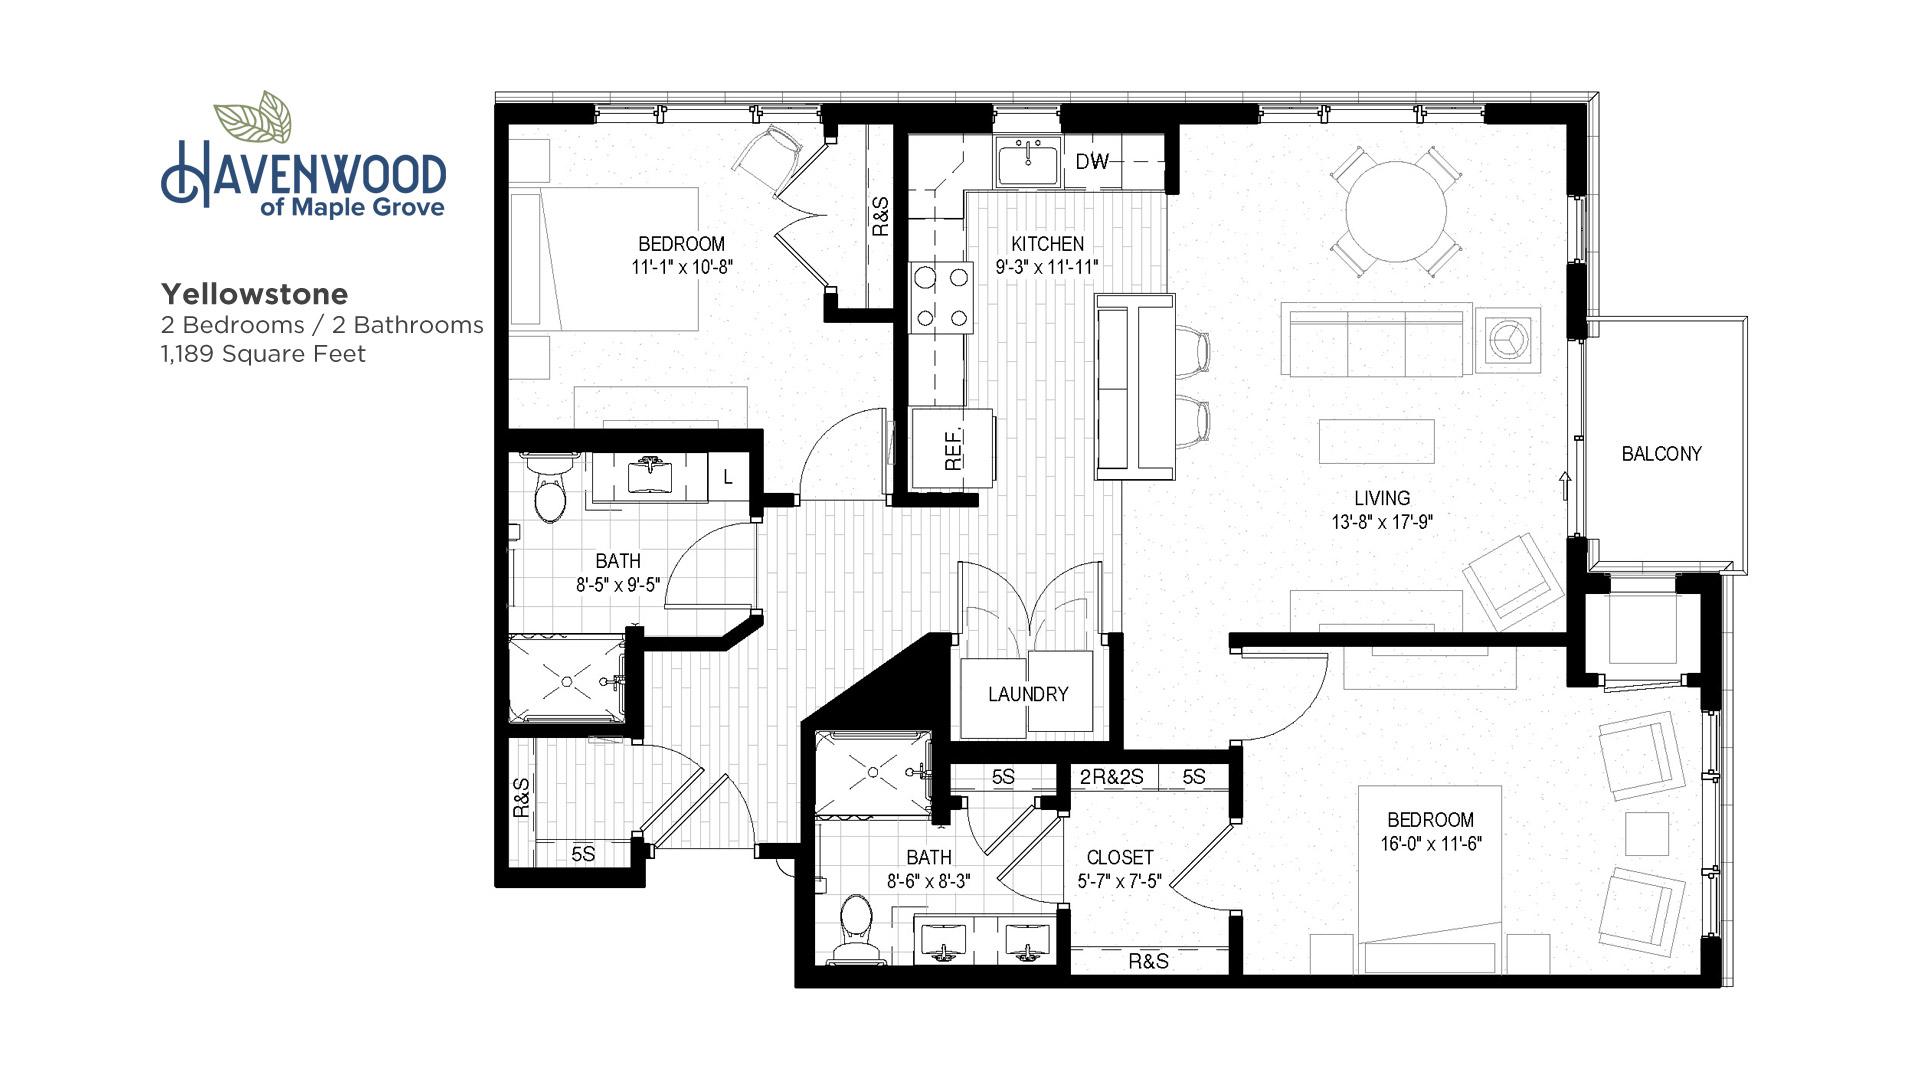 Havenwood of Maple Grove Yellowstone Floor Plan